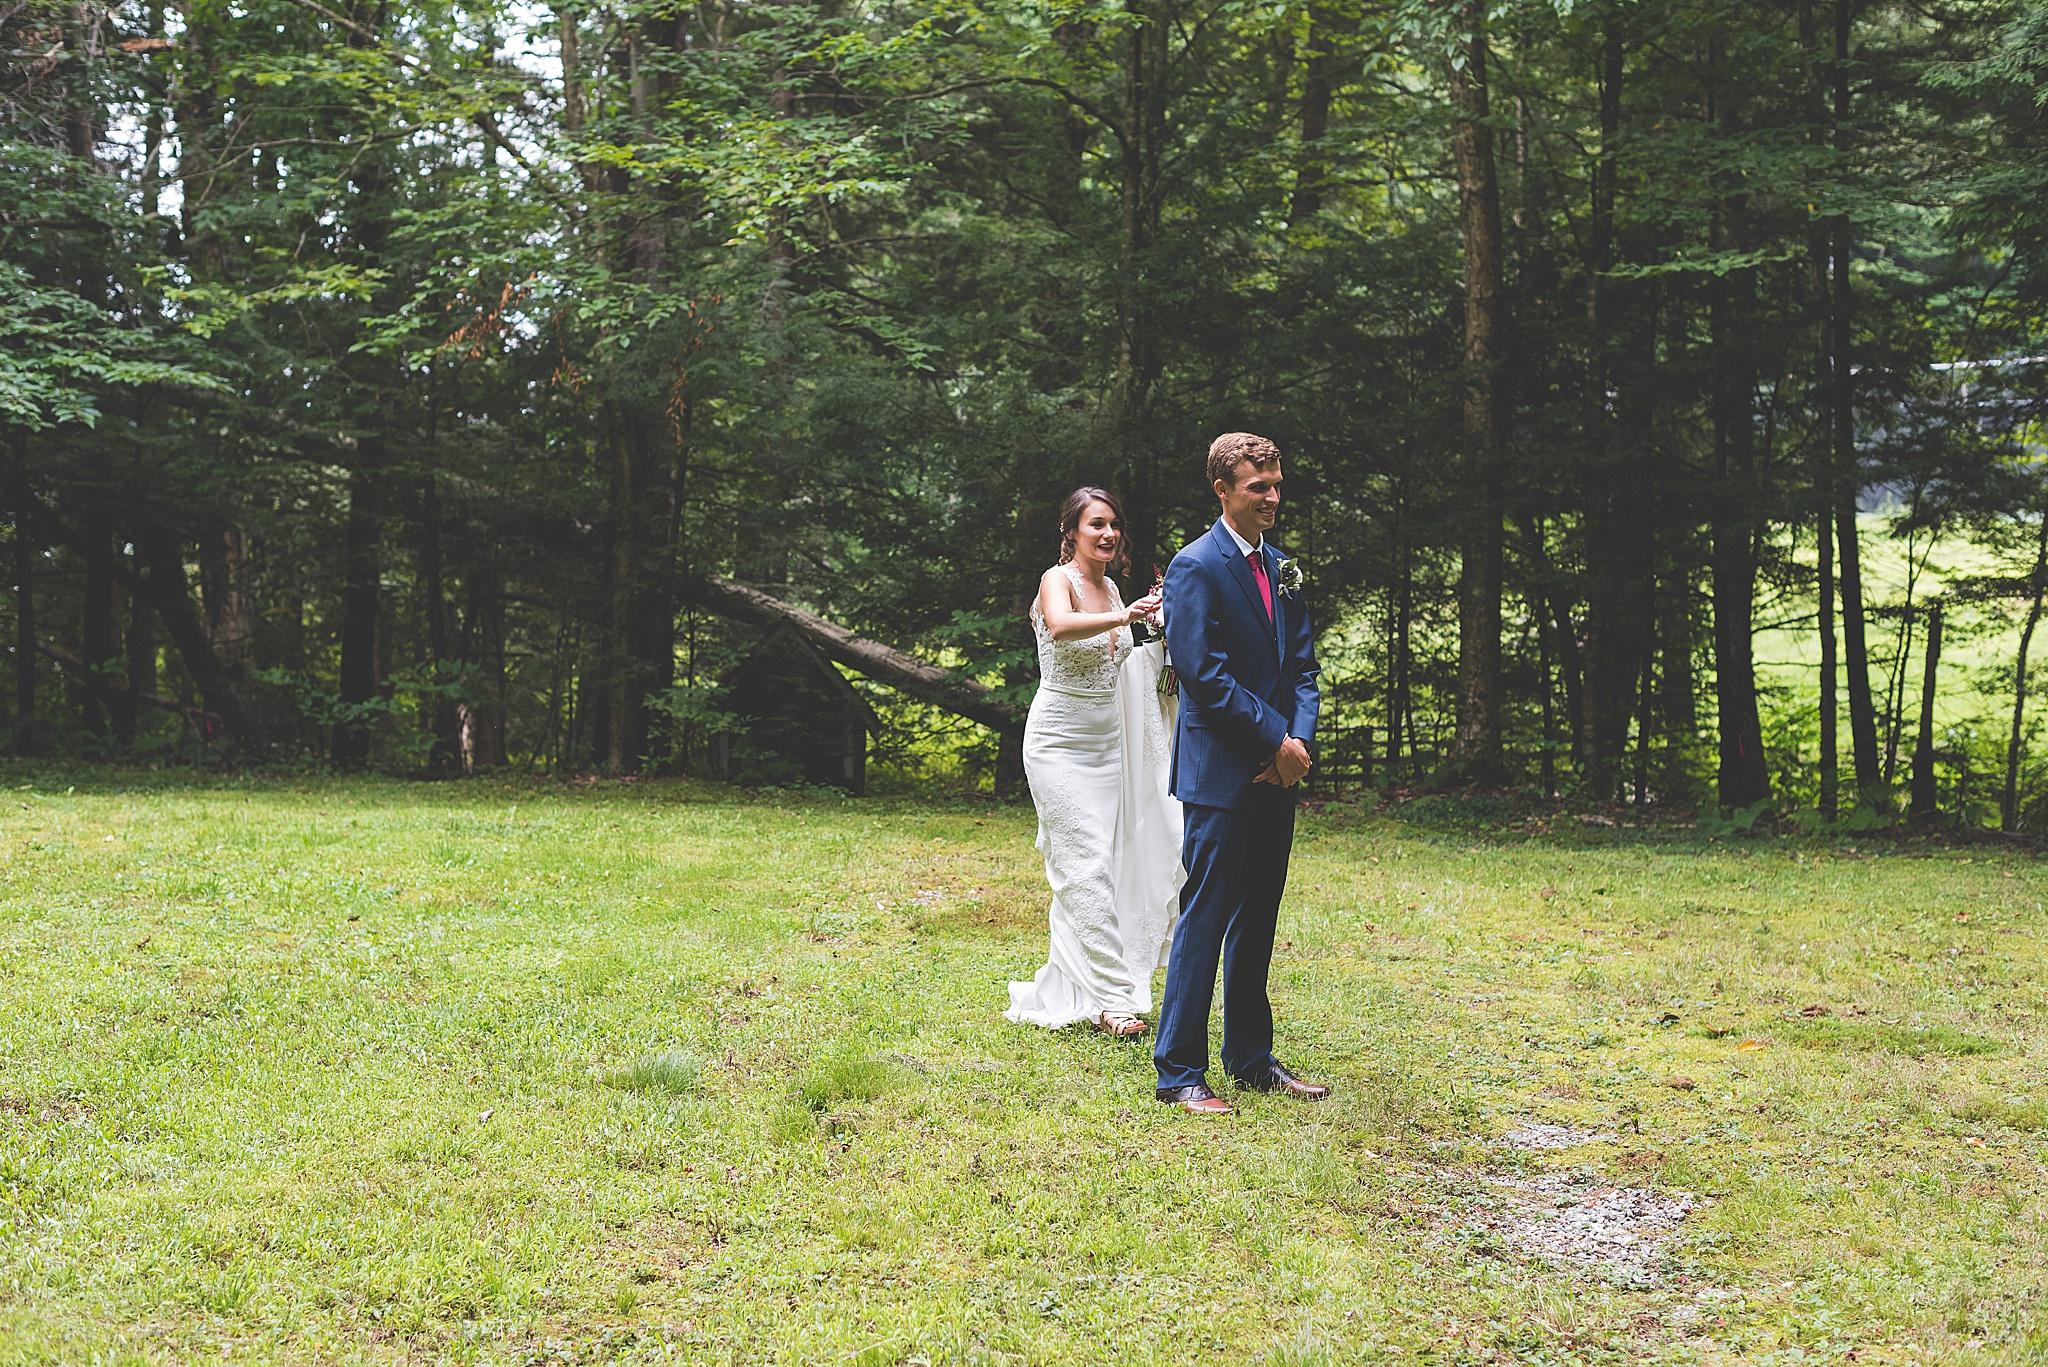 Albany_Wedding_Photographer_7480.1.jpg